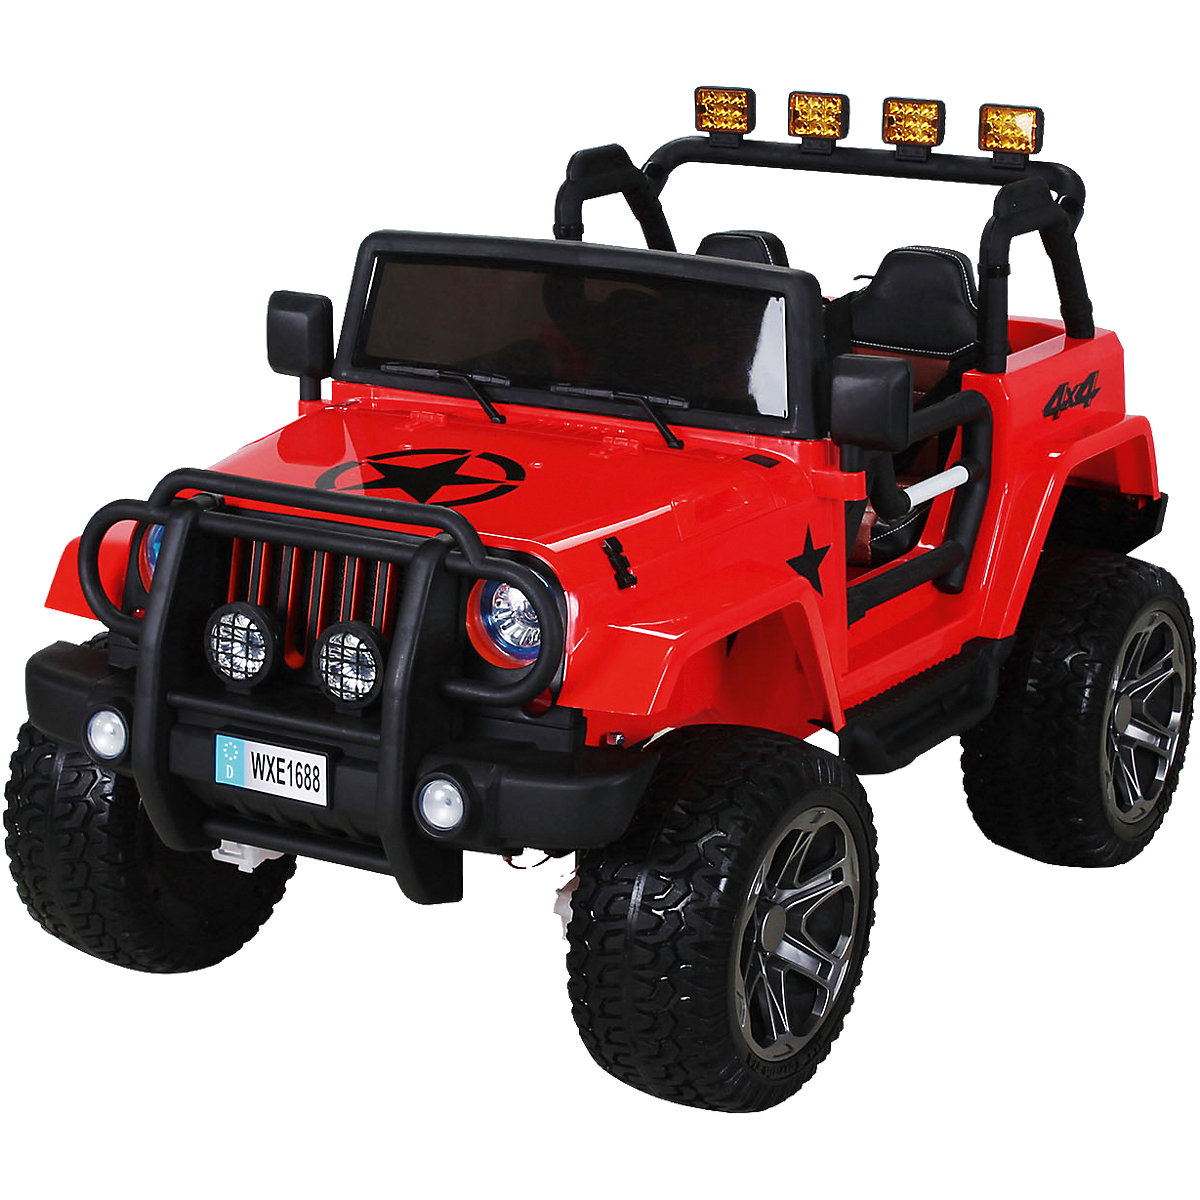 kinder elektroauto wrangler offroad jeep allrad 2 sitzer rot mytoys. Black Bedroom Furniture Sets. Home Design Ideas